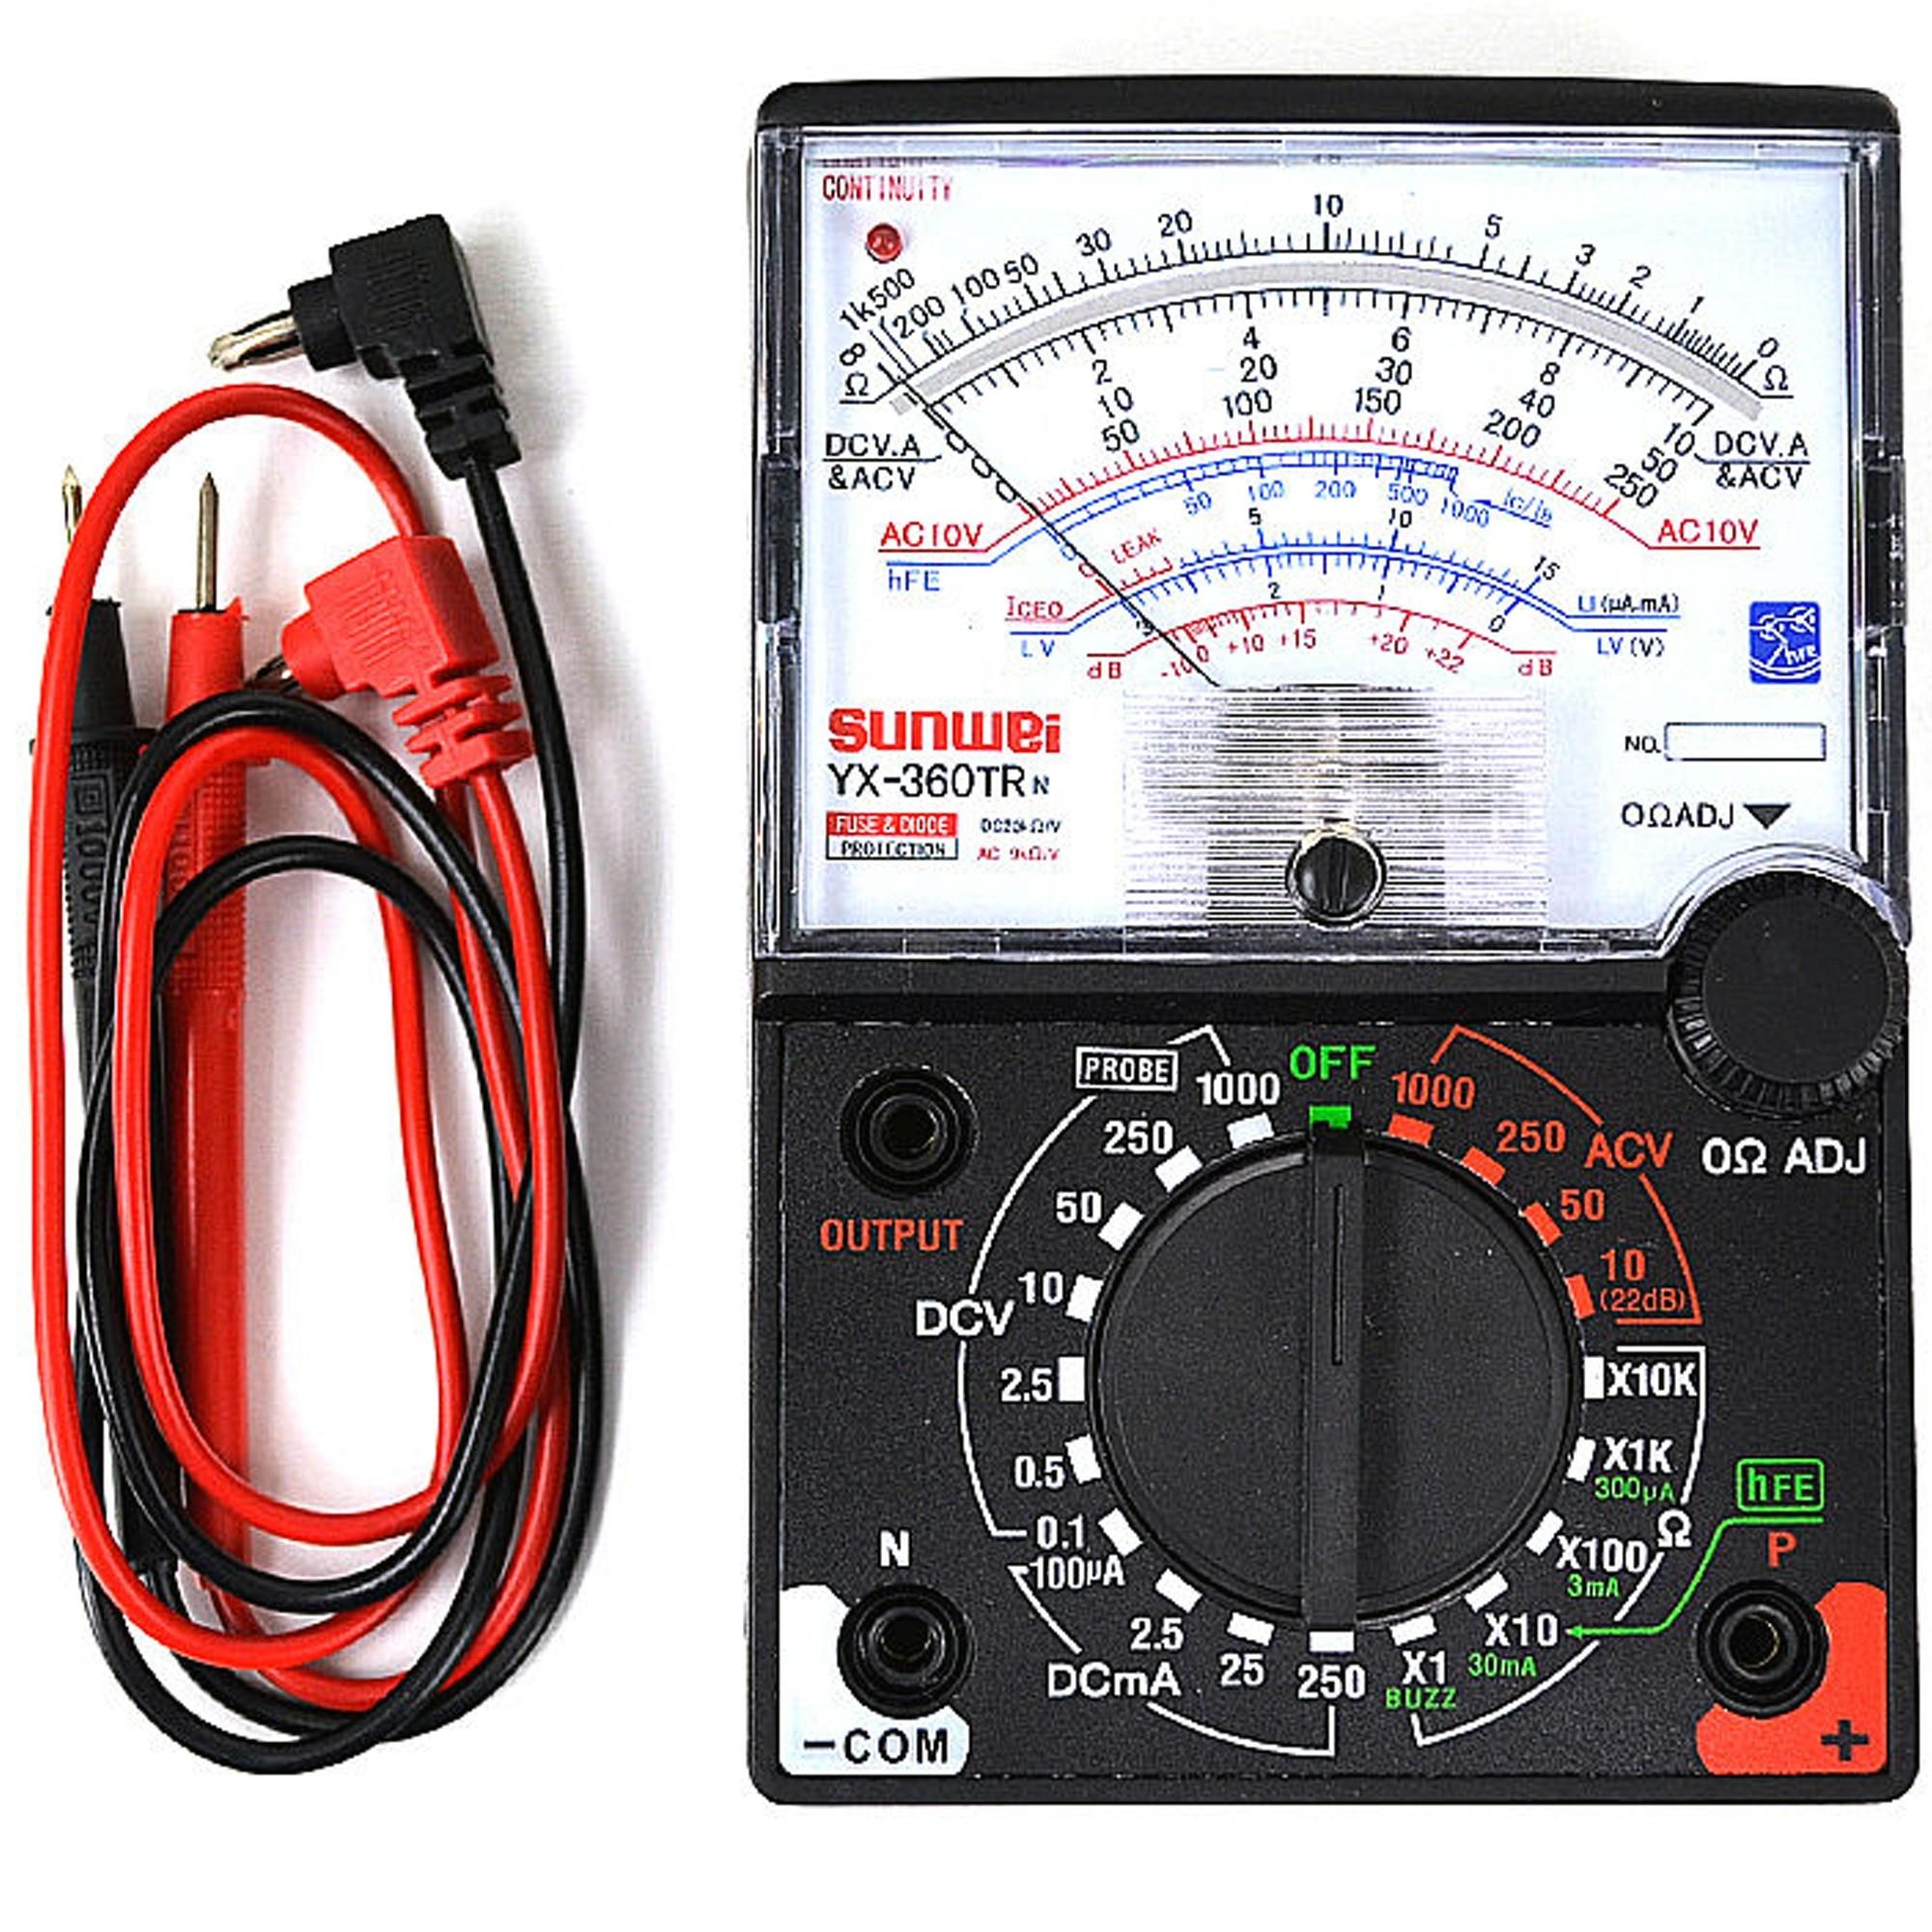 Candide Misuratore Analogico Portatile Voltmetro Amperometro Ohmmetro Yx-360trn